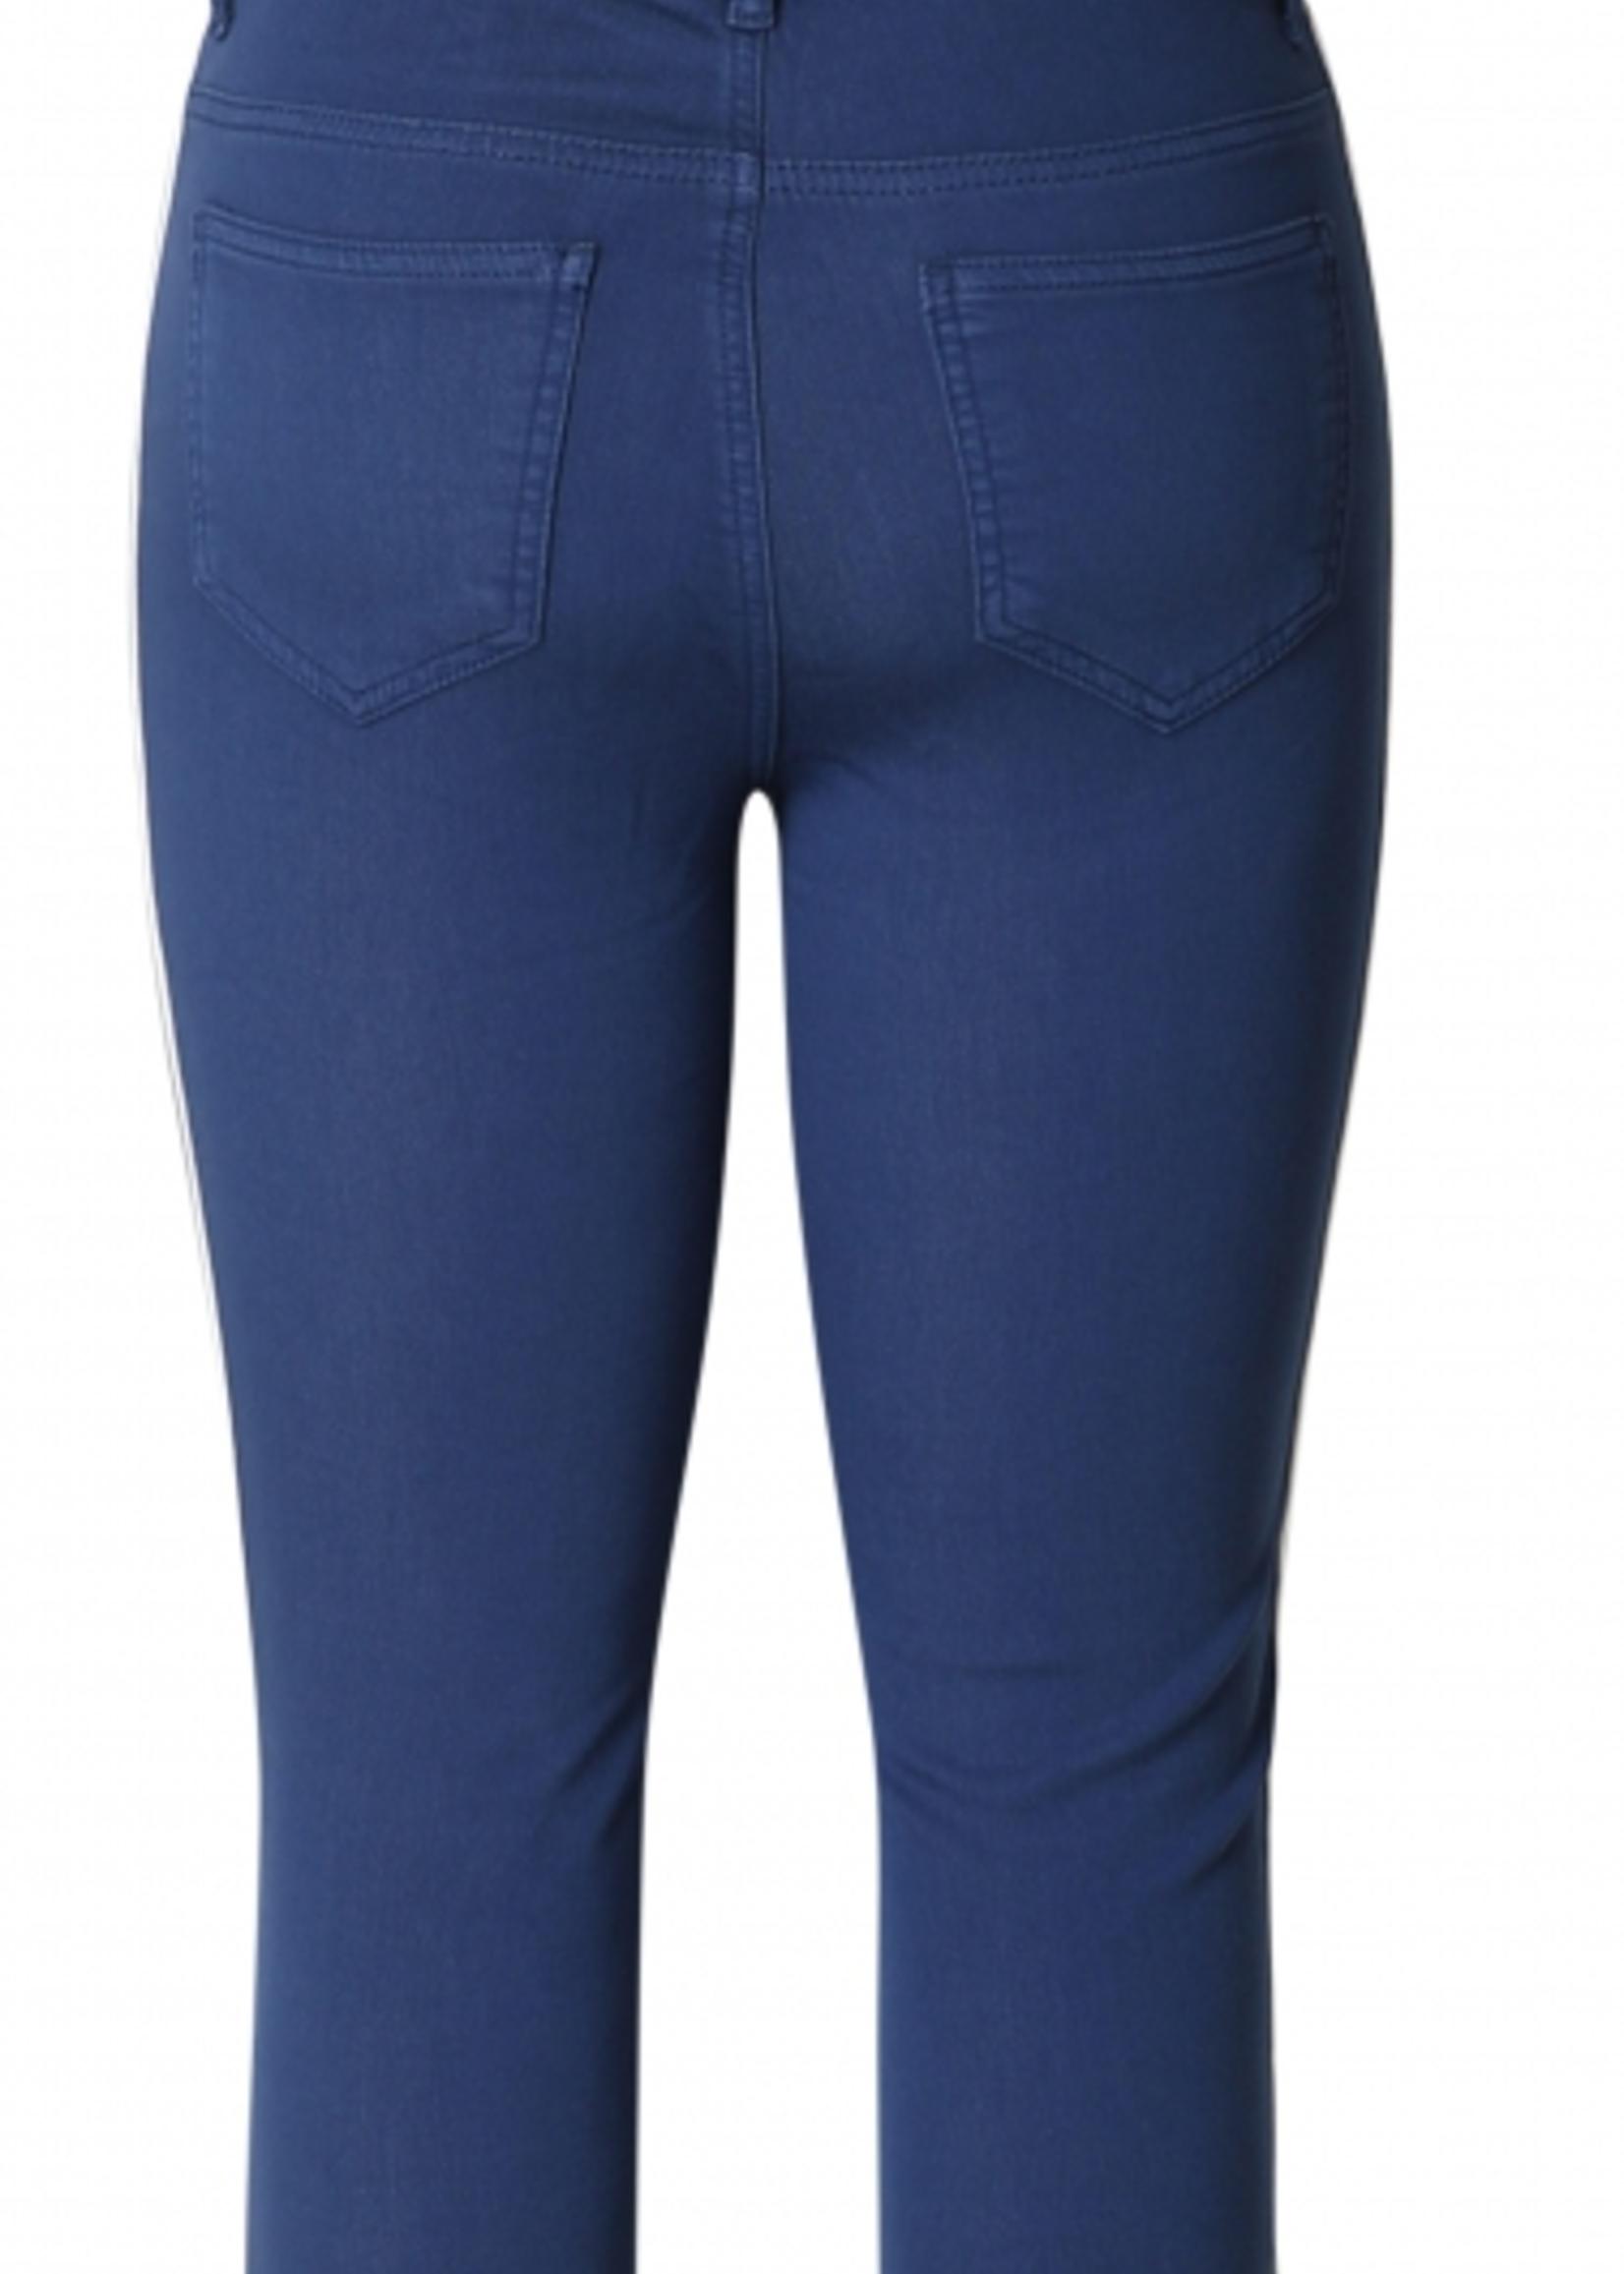 Yesta Yesta Lindsey Jeans